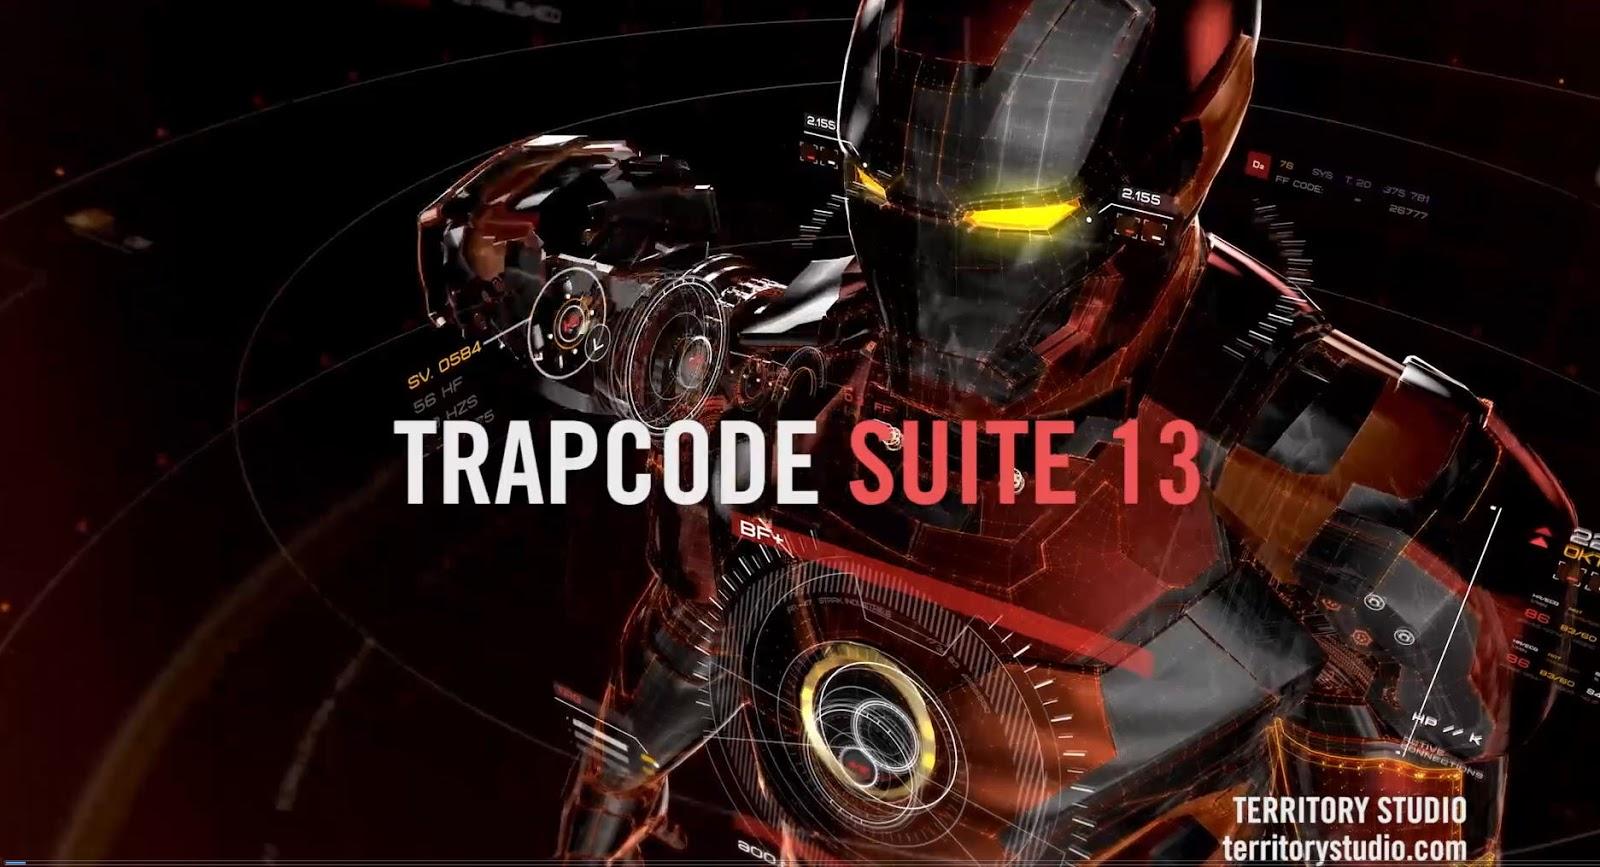 Trapcode particular торрент